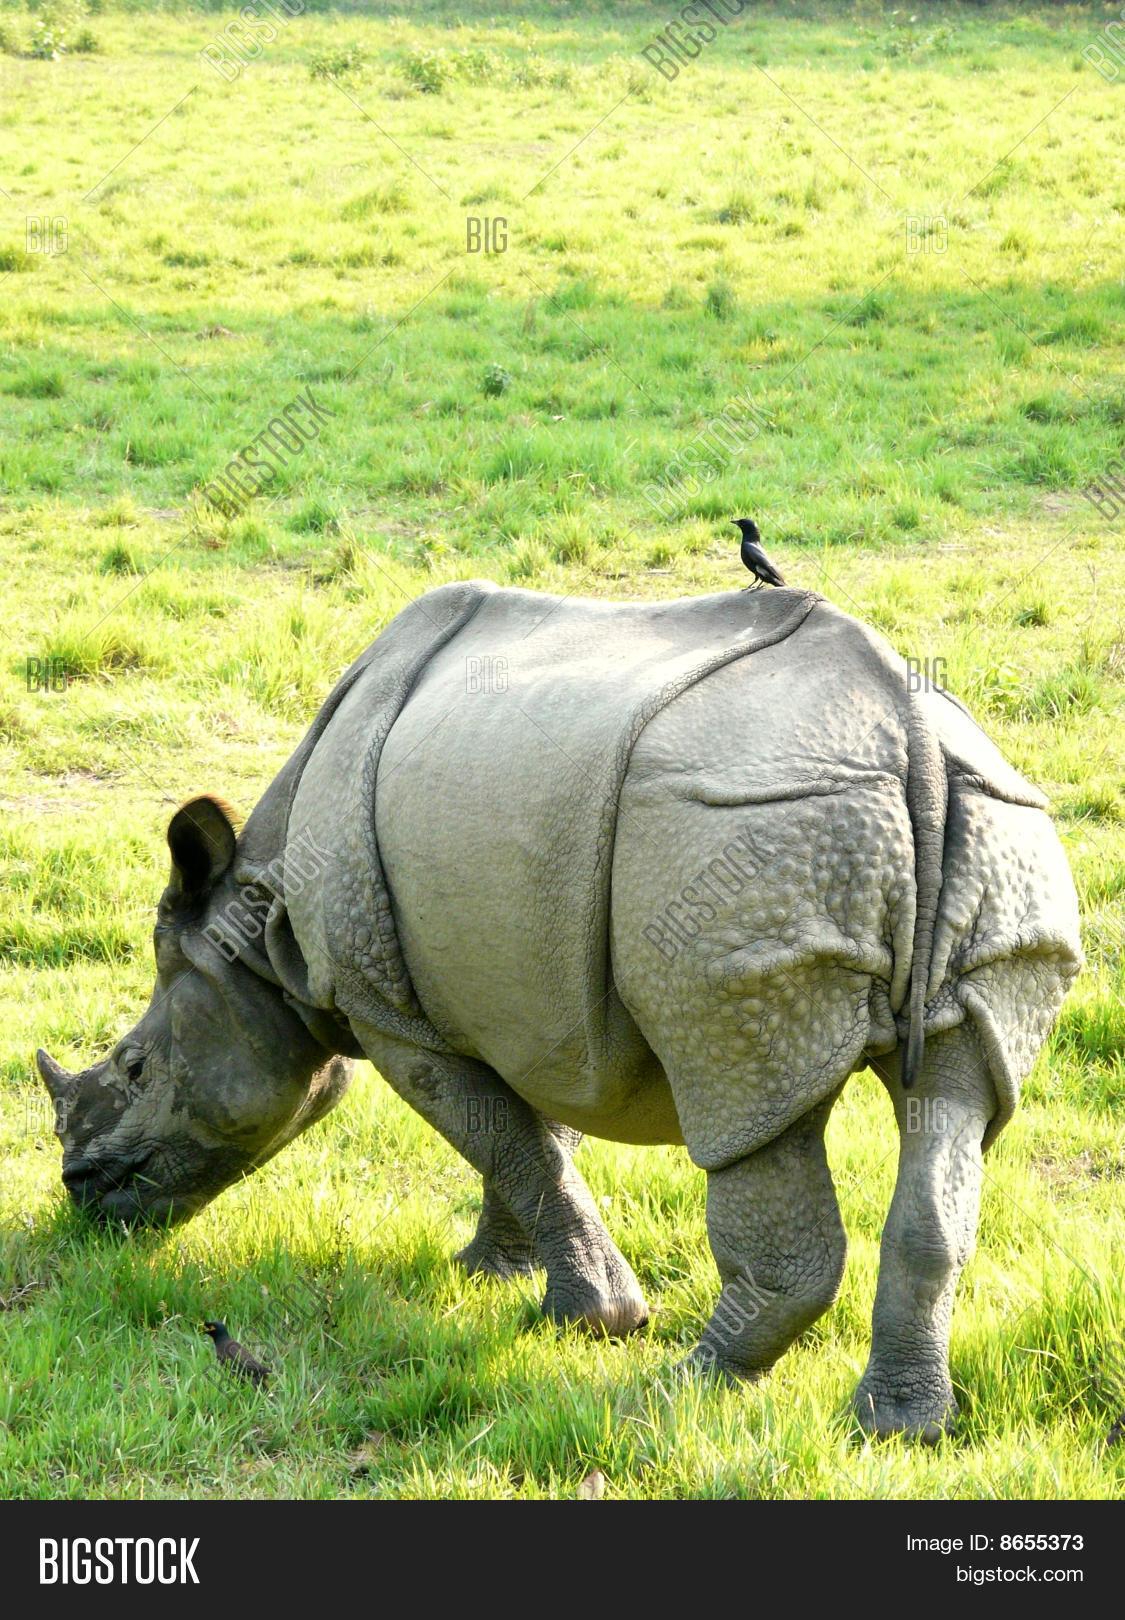 Wild White Rhino Bird Image & Photo (Free Trial) | Bigstock